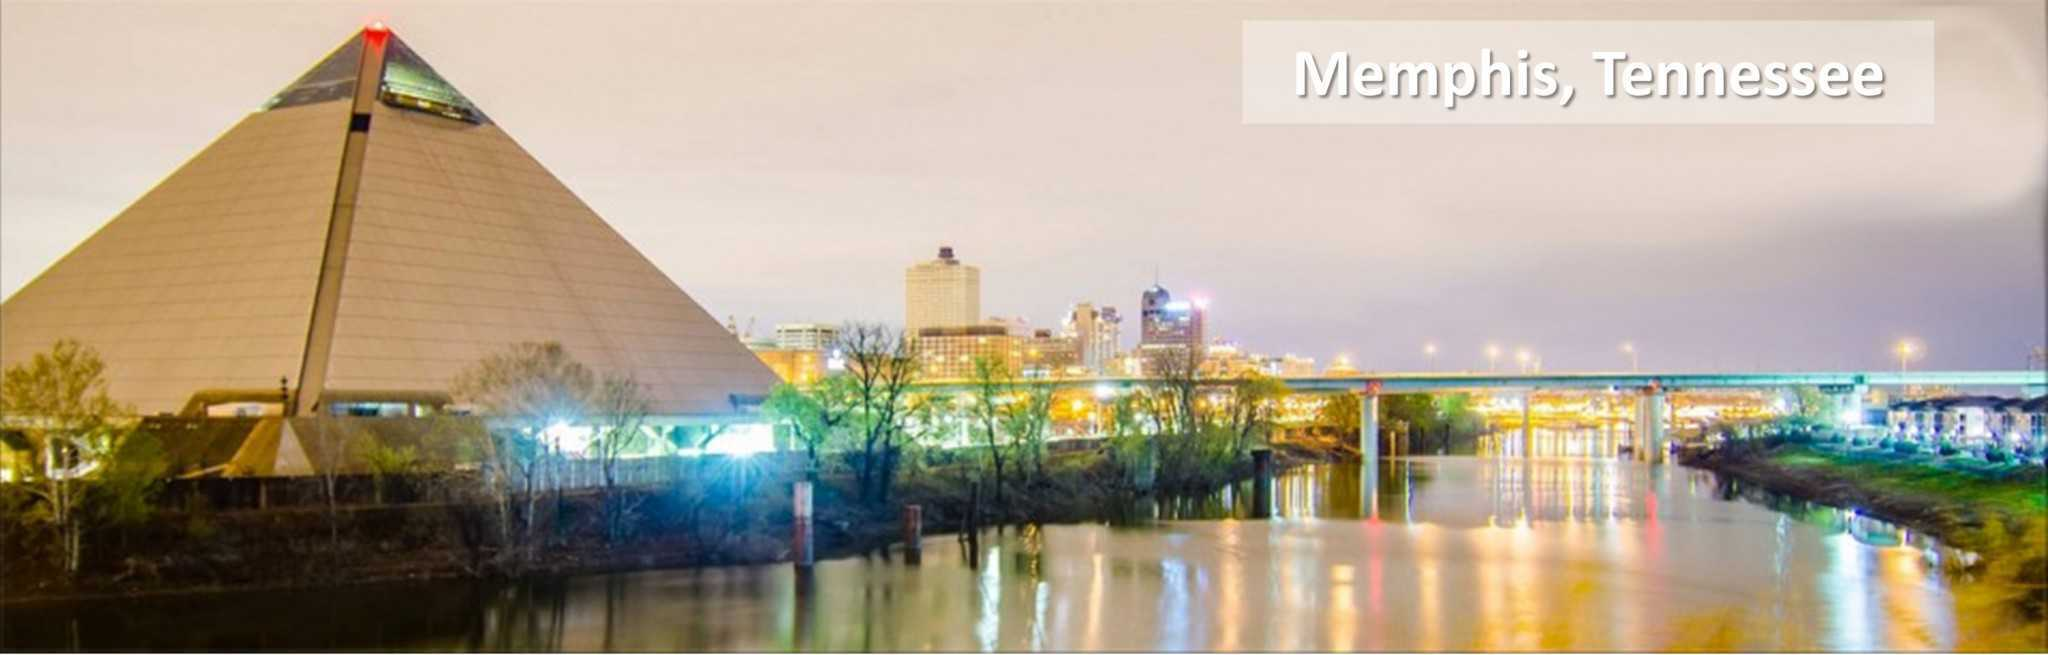 Pyramid Memphis